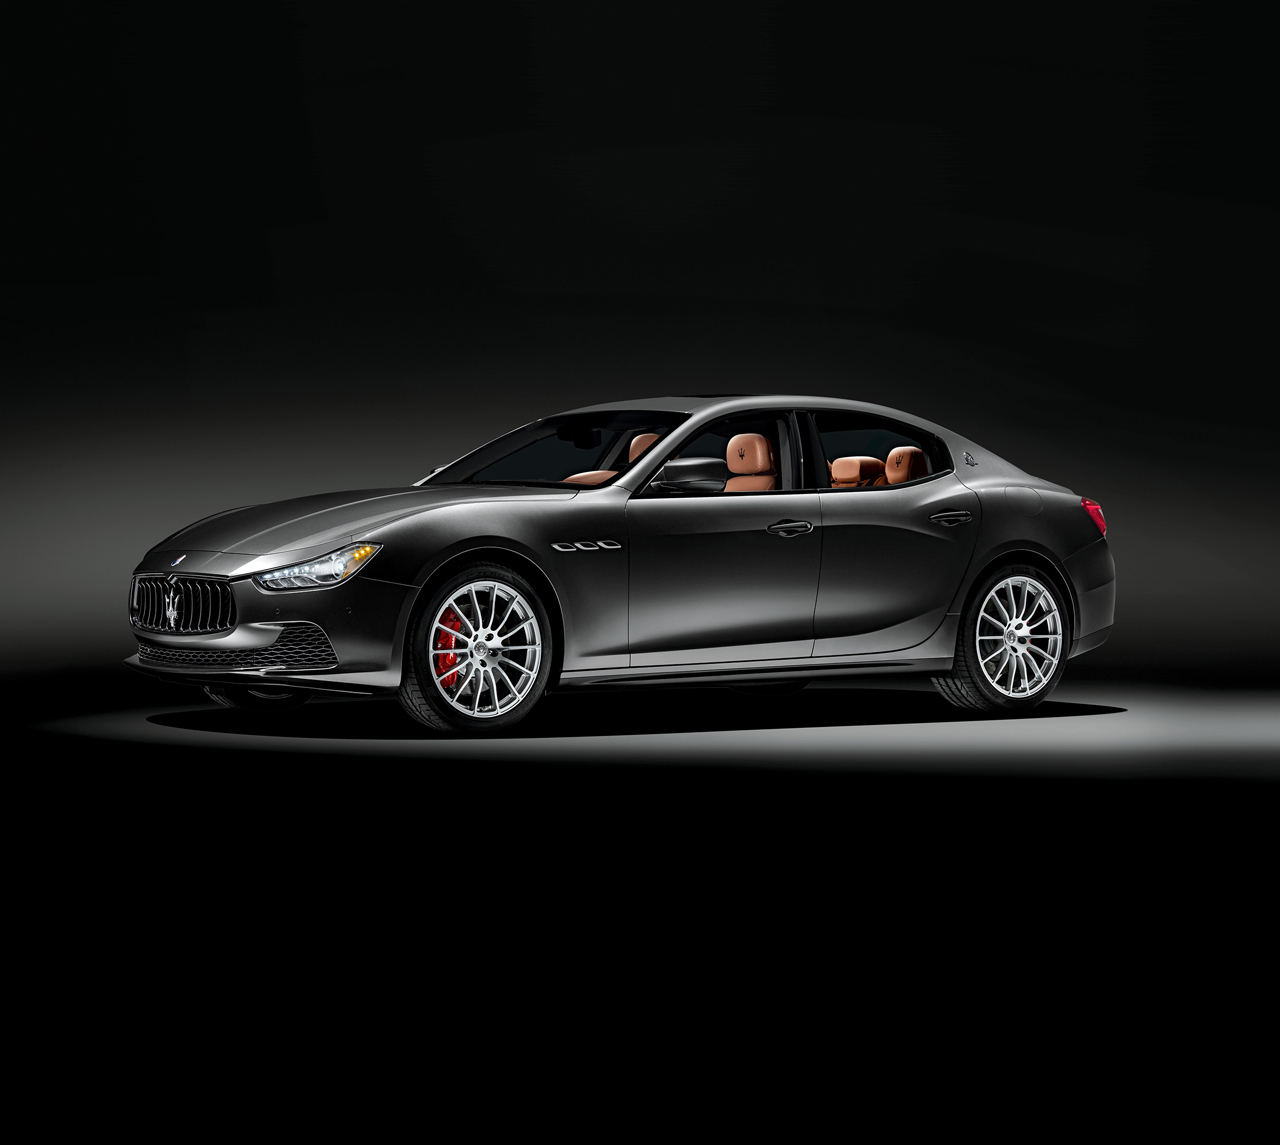 2013 Kia Pro Ceed GT